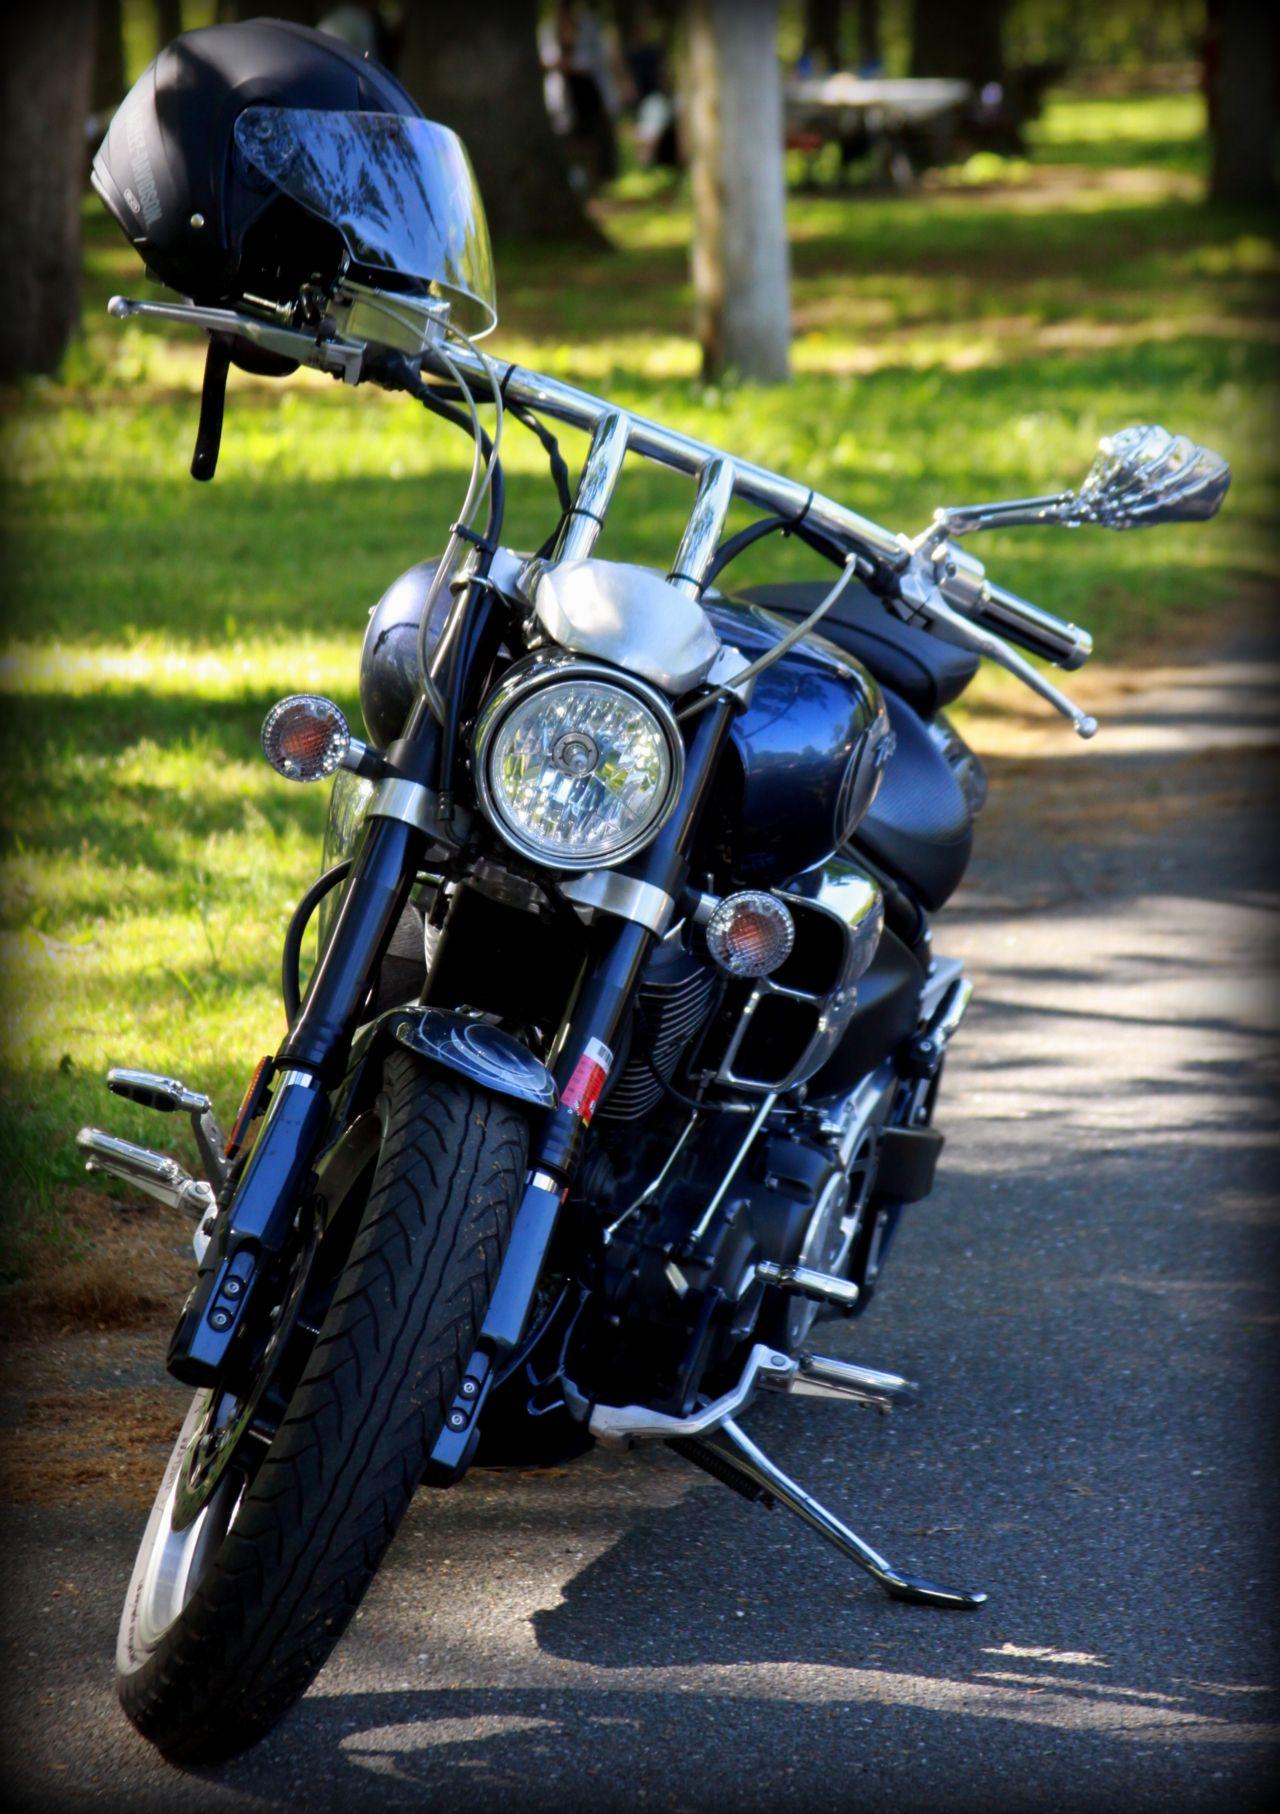 Yamaha Warrior Rob Motorbikes Bike Motor Car